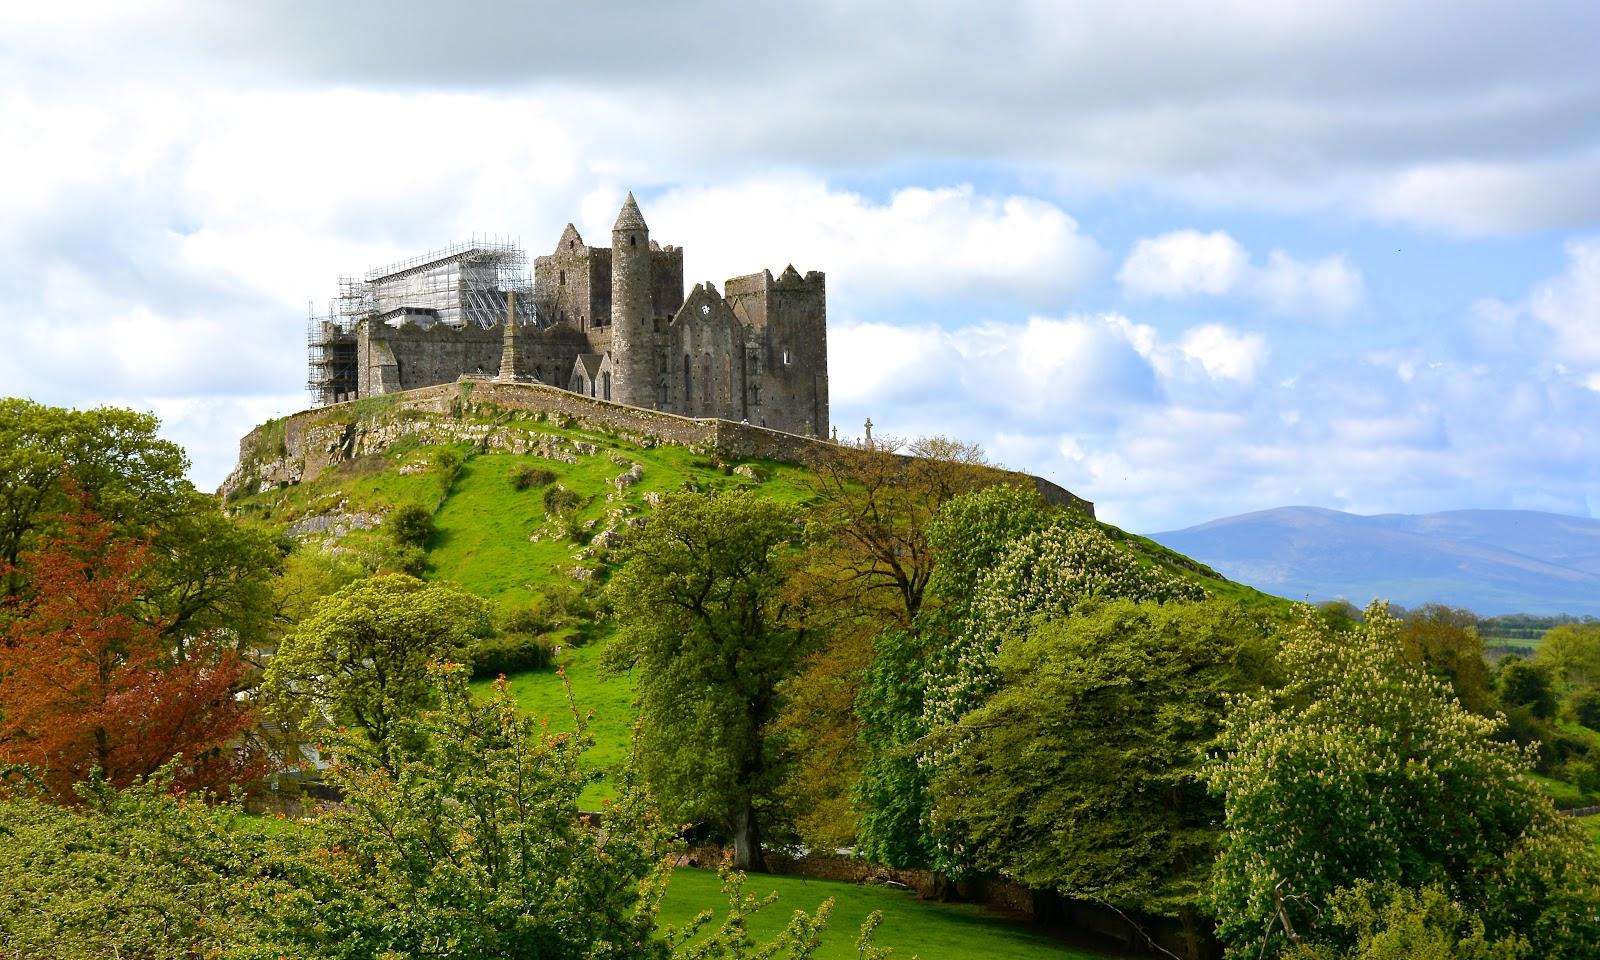 Rock of Cashel in County Tipperary, Ireland